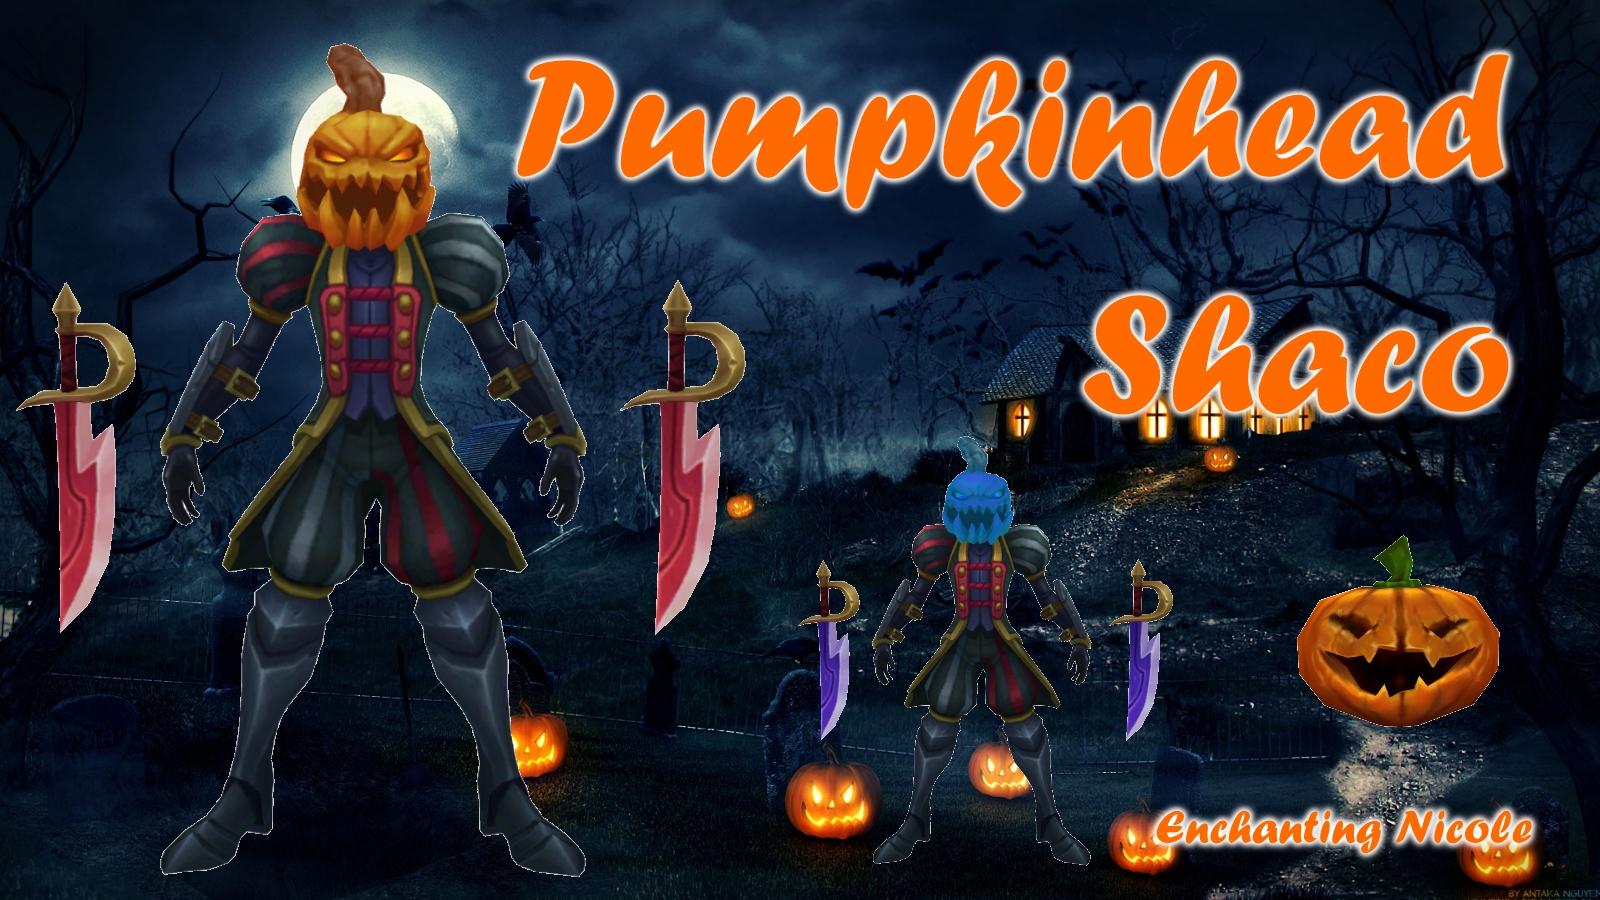 Pumpkinhead Shaco